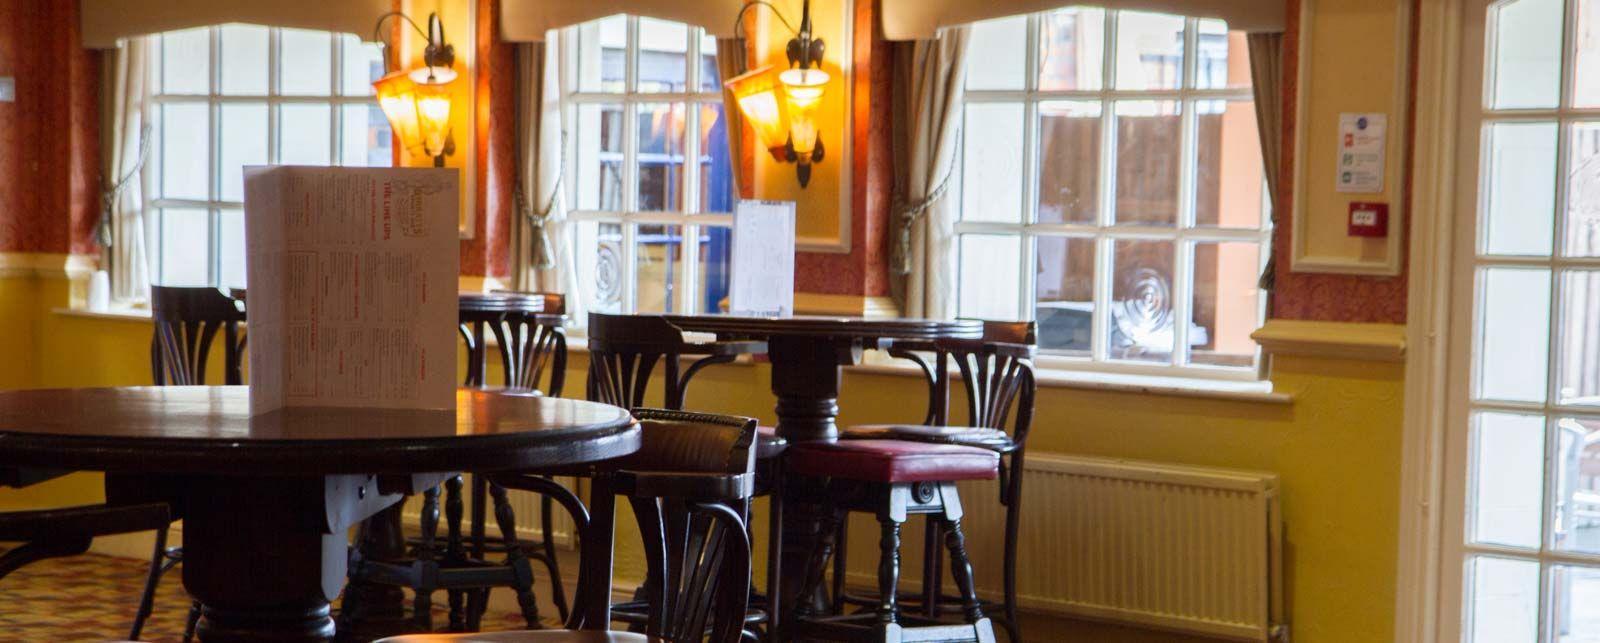 barratts | pub | northampton | snooker | real ale | food | live sport